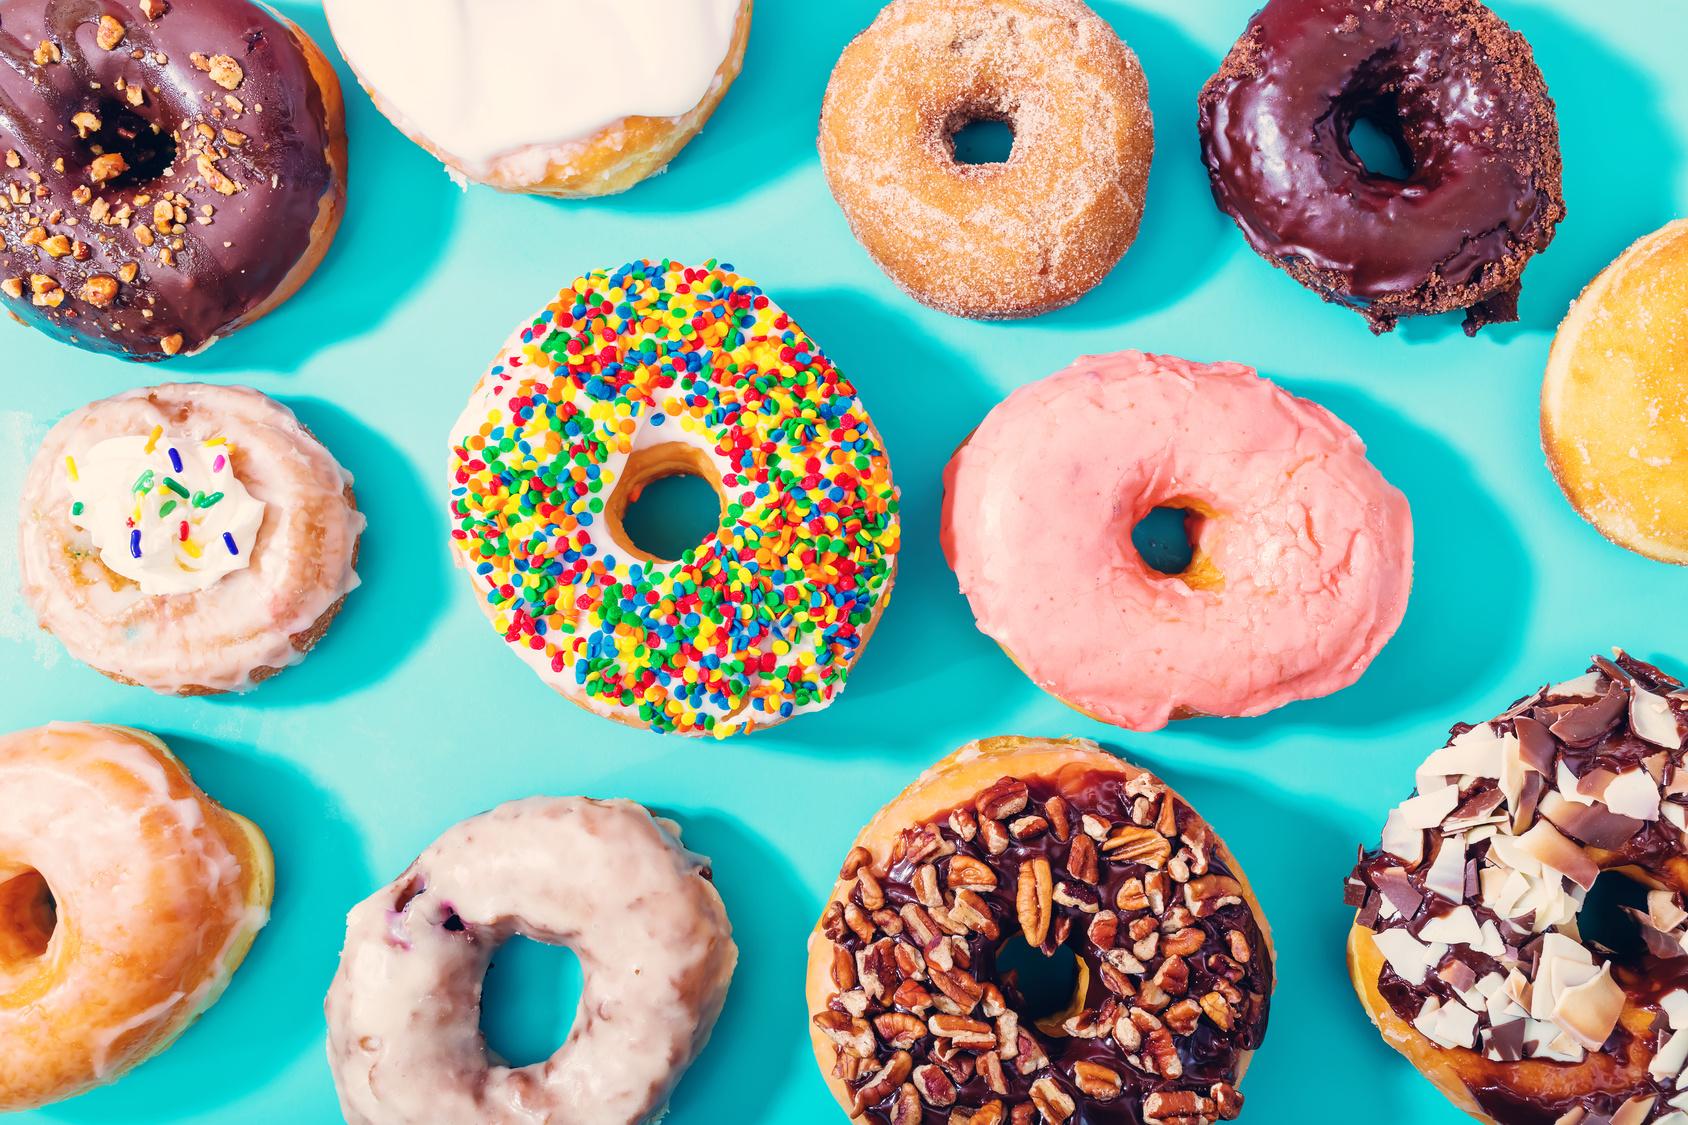 BodyChange_Cheat Day_Doughnuts